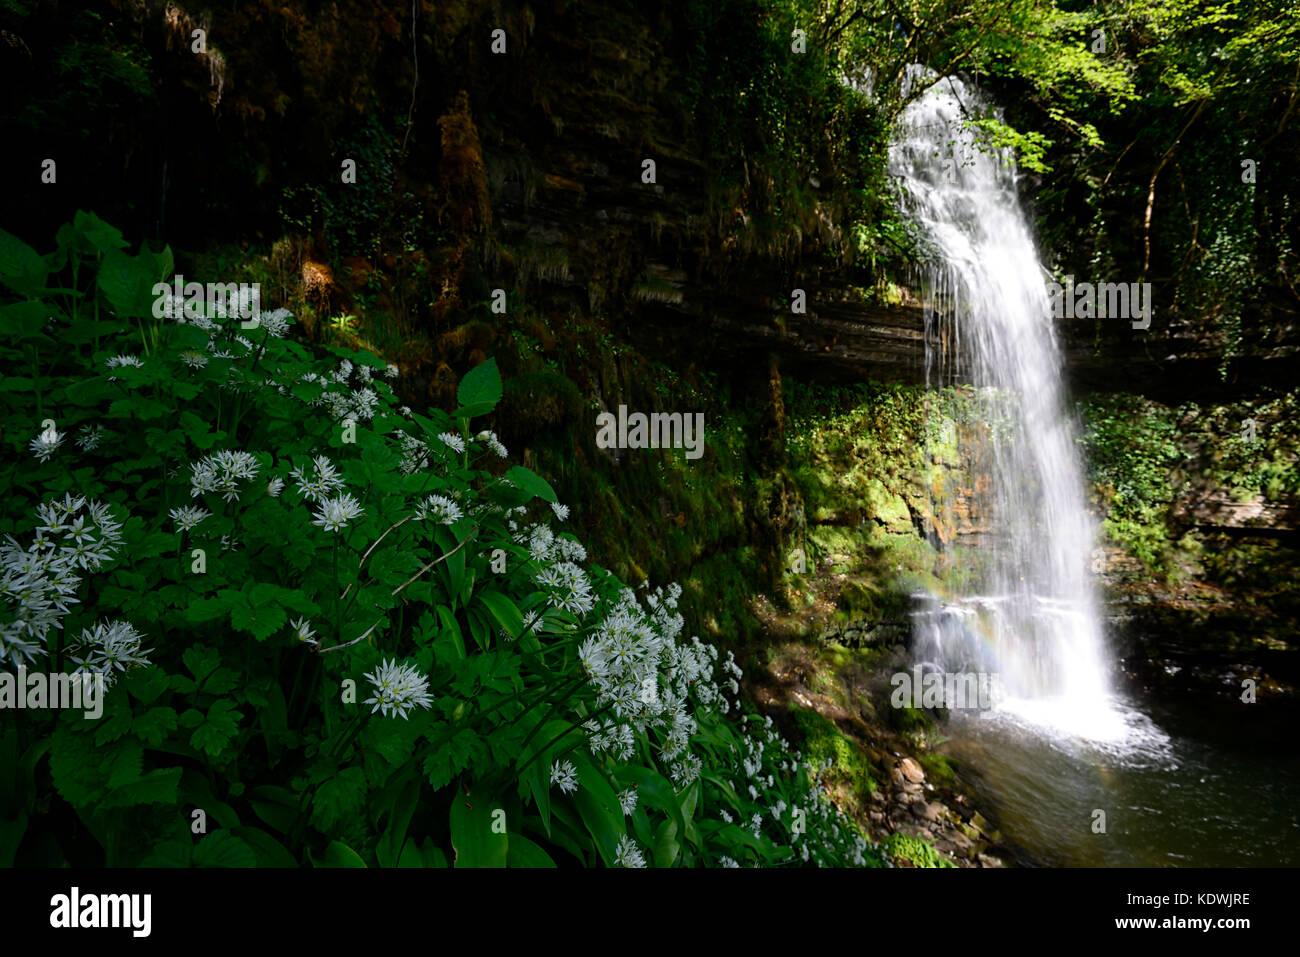 Glencar Waterfall, Inspire, Inspiration, The Stolen Child, poem, poetry, William Butler Yeats, County Leitrim, Ireland, - Stock Image